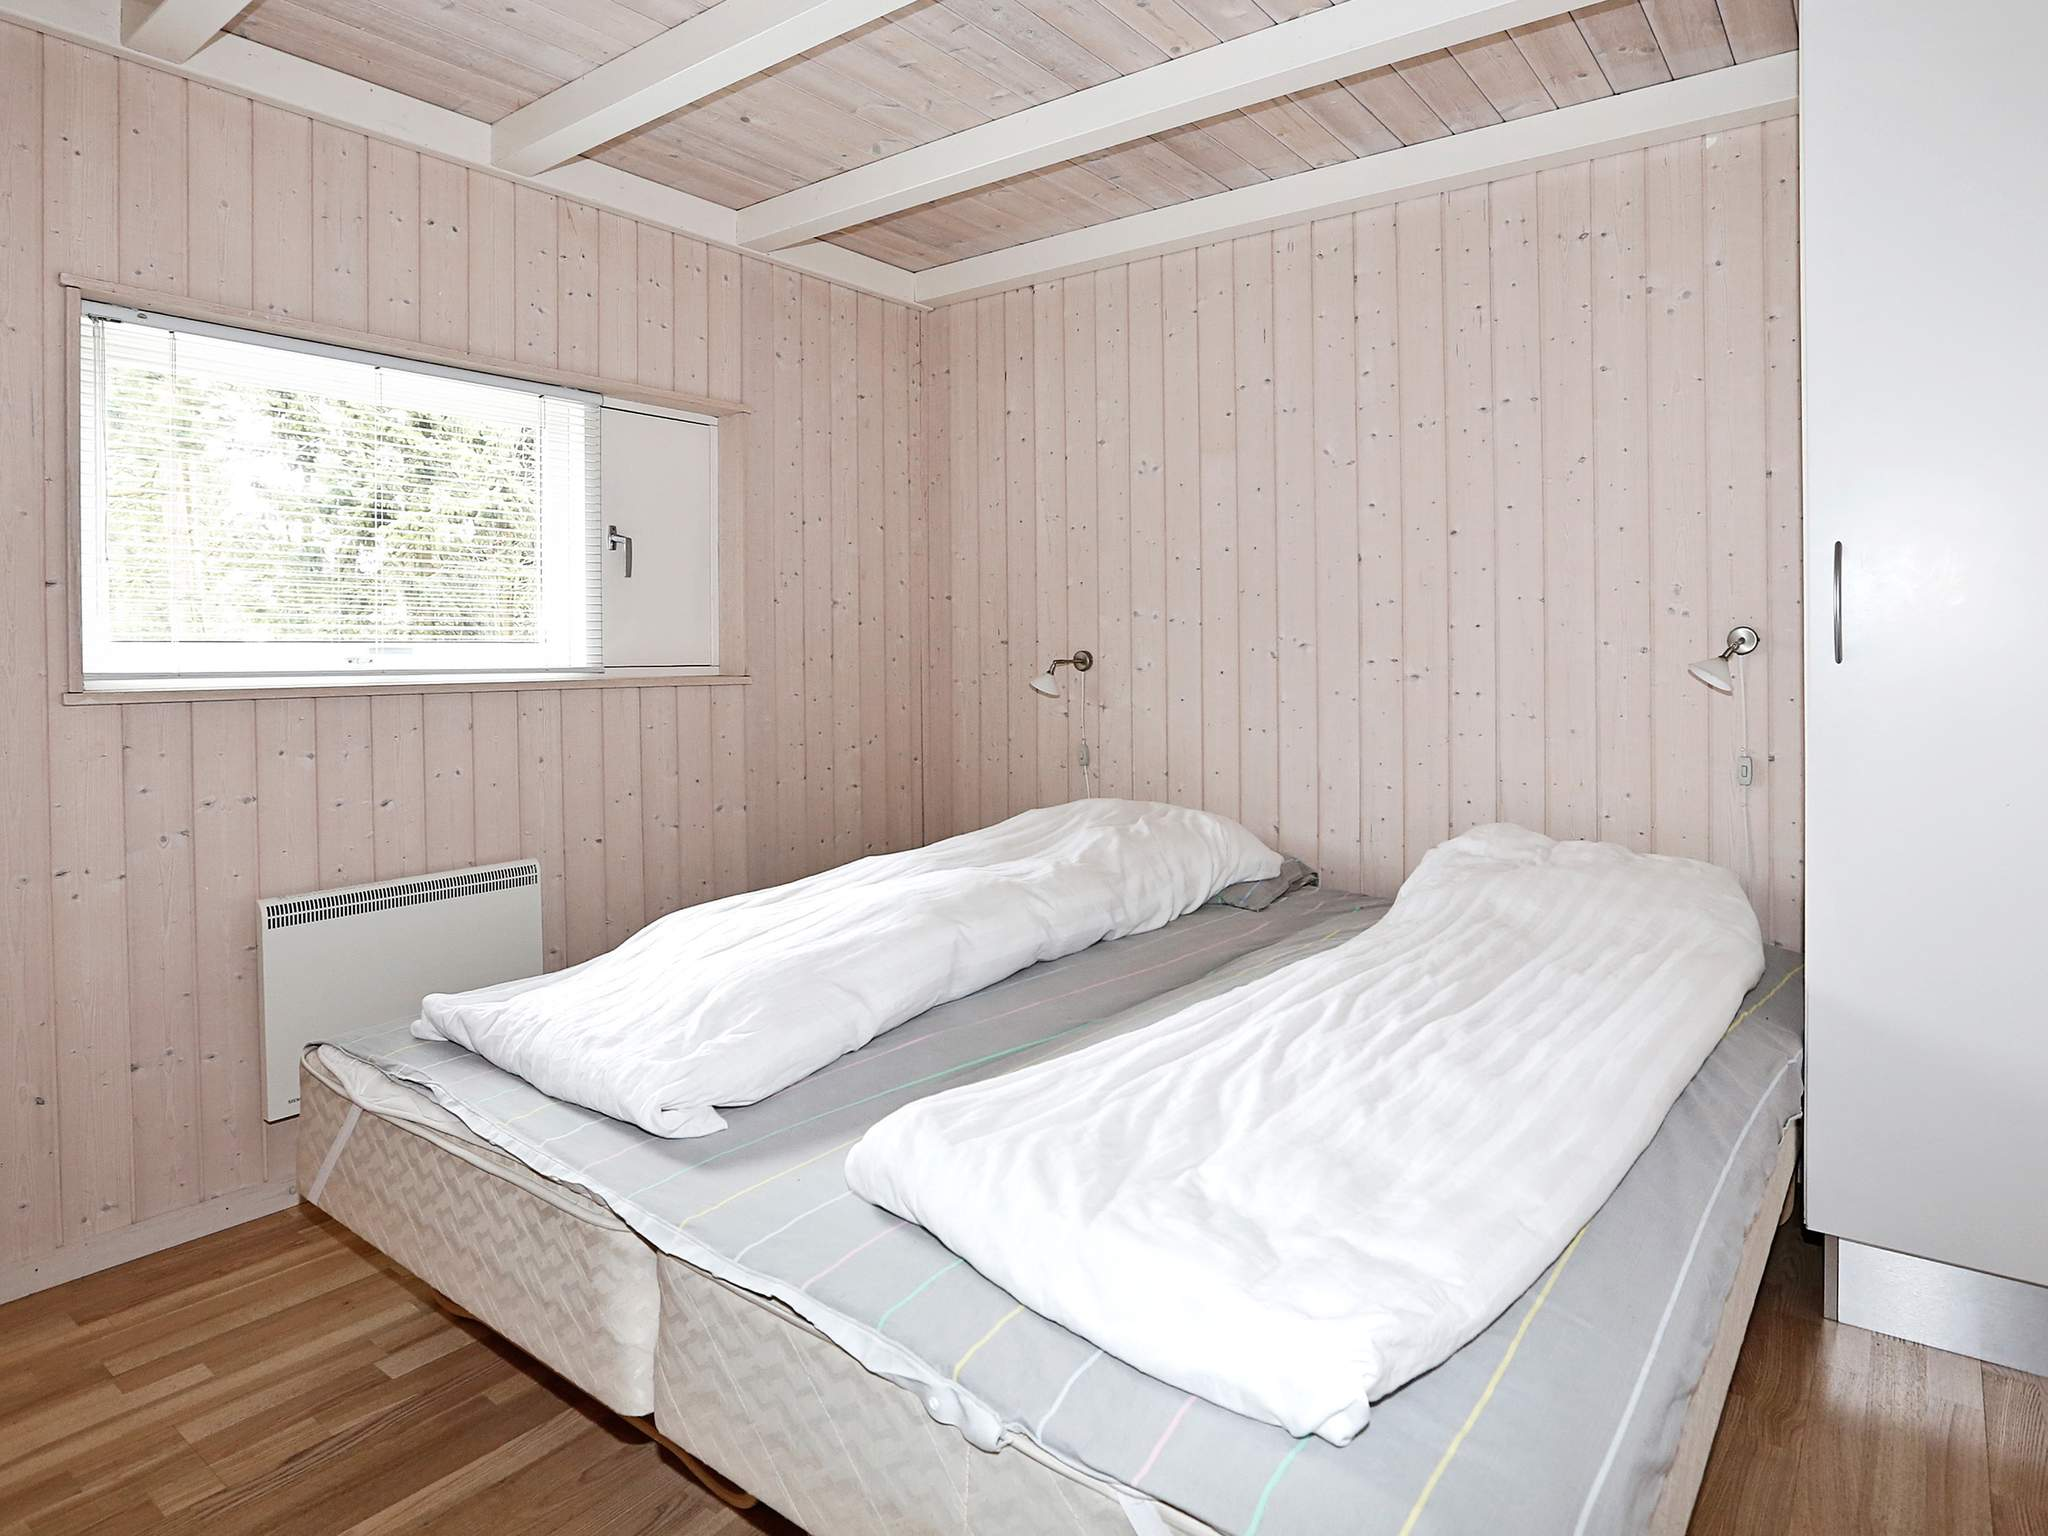 Maison de vacances Skibby (124927), Kirke Hyllinge, , Seeland Nord, Danemark, image 11